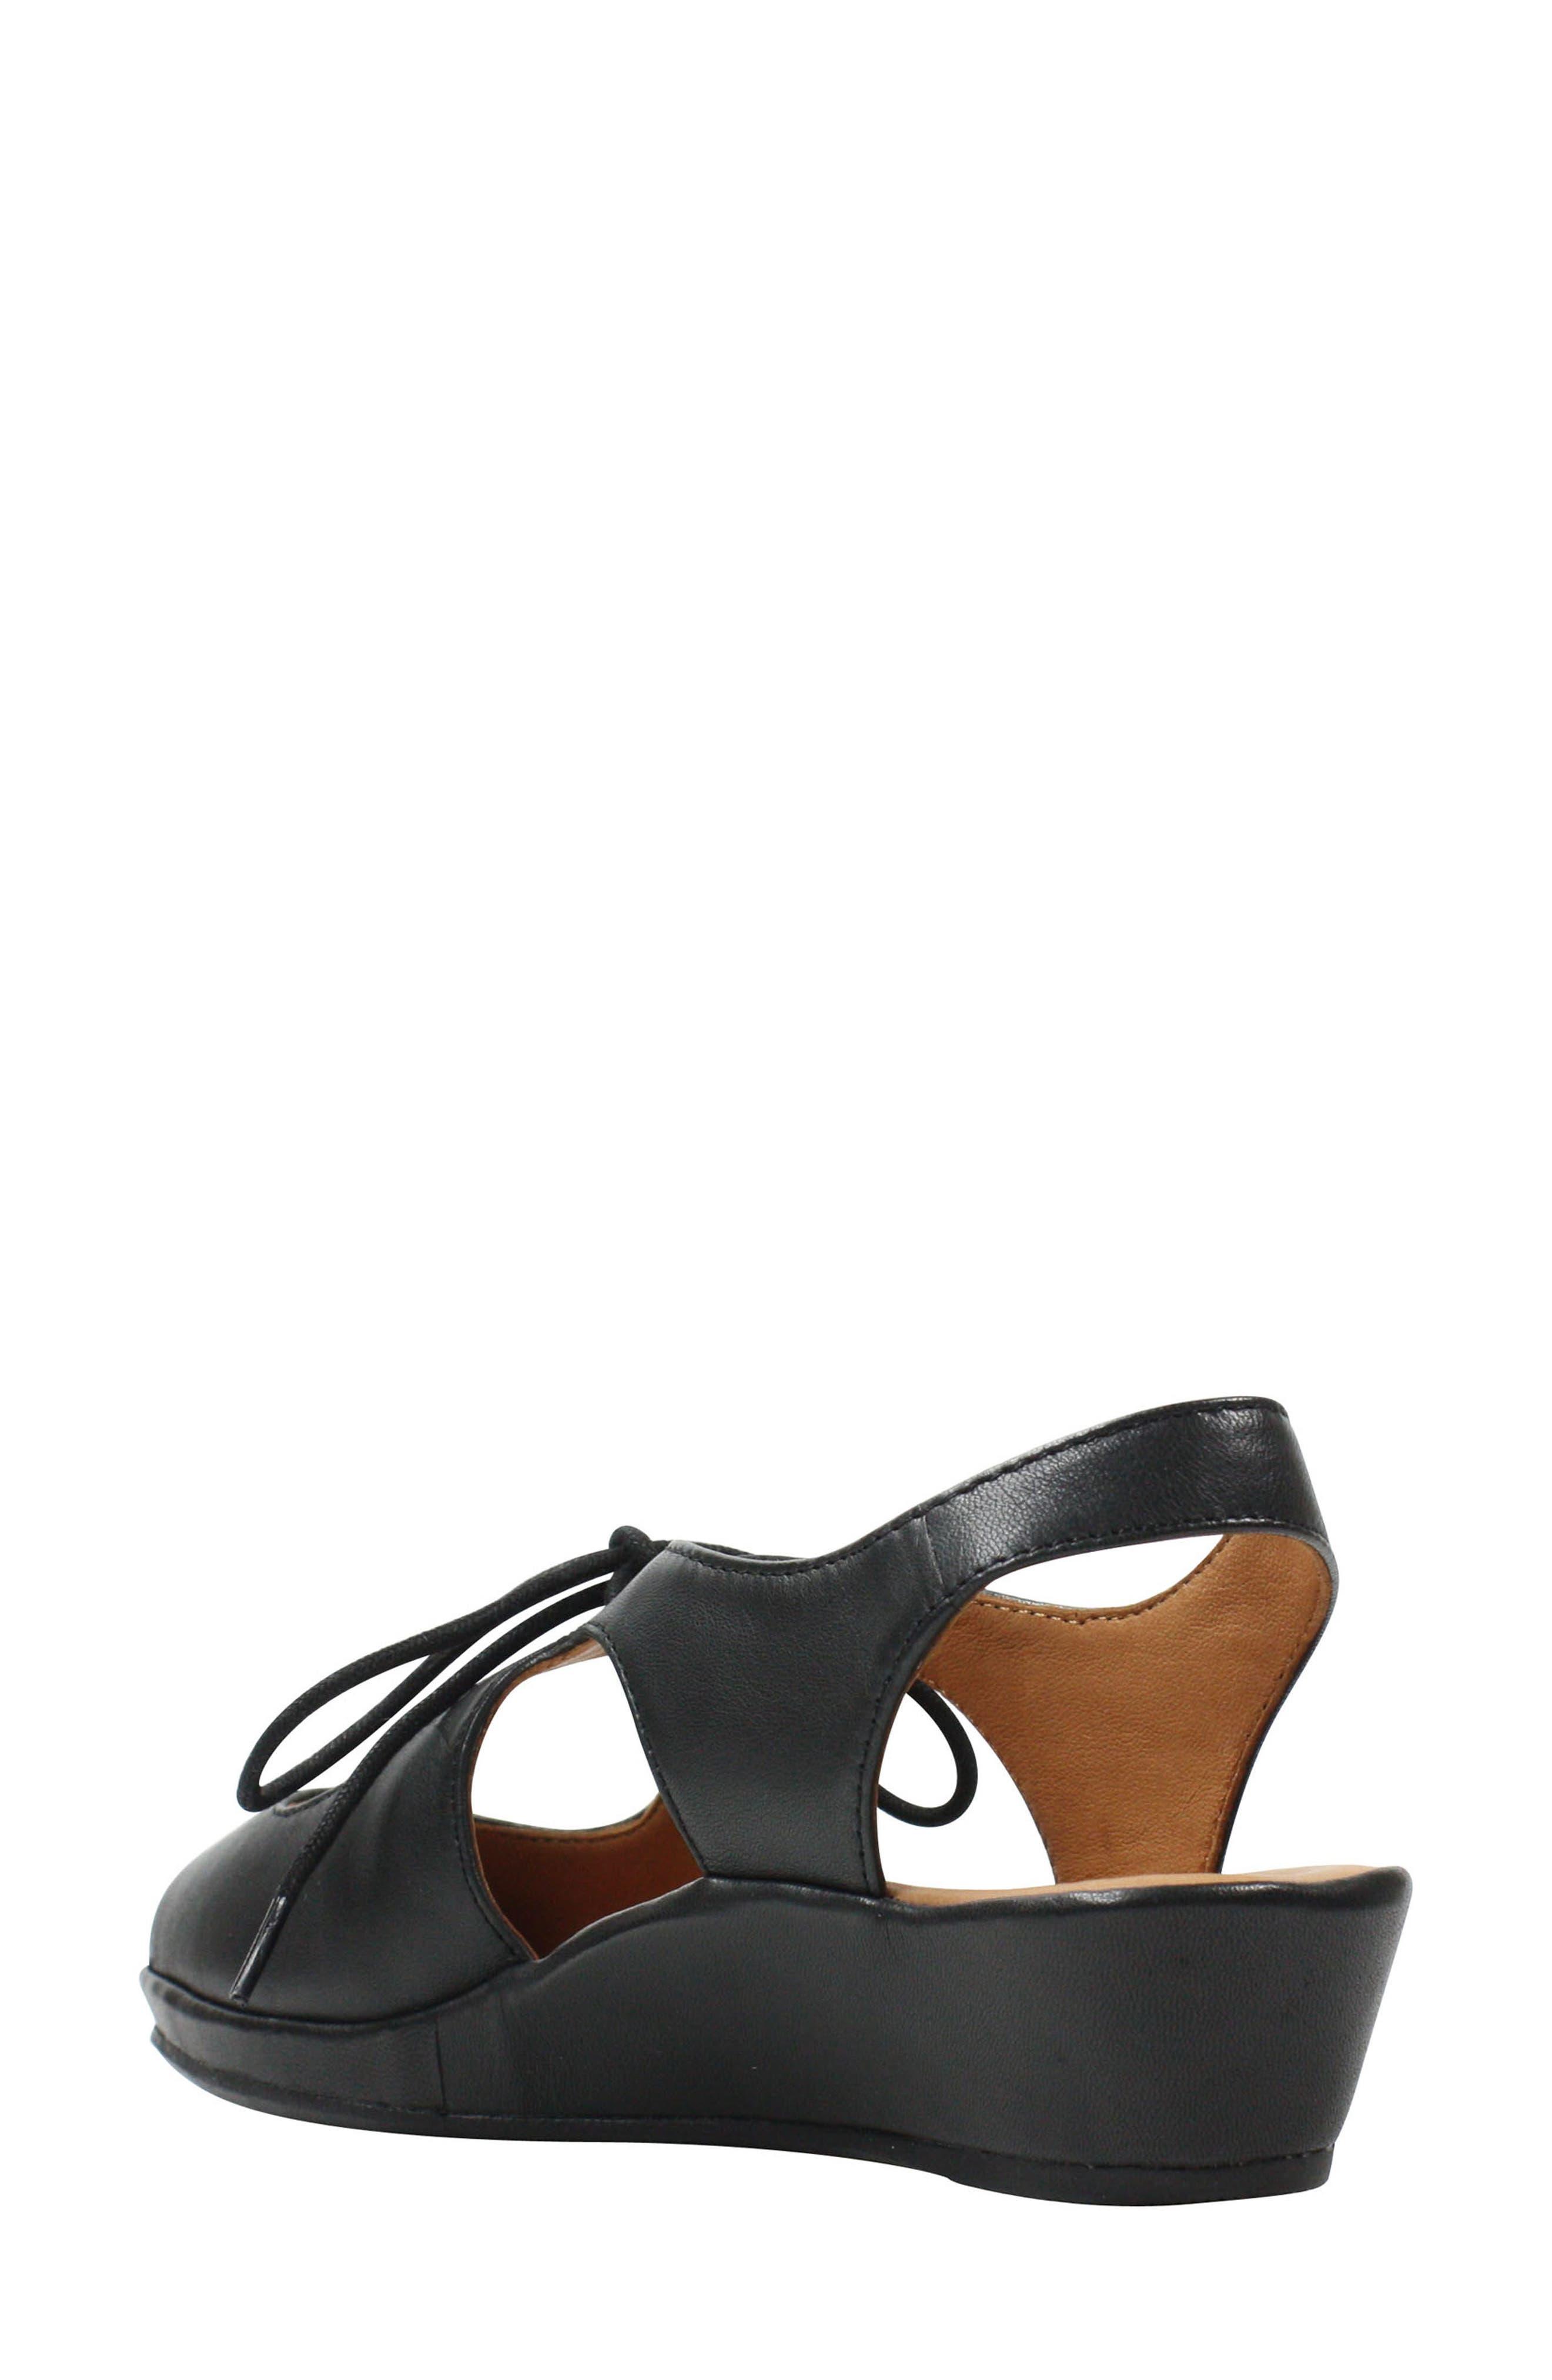 Brettany Sandal,                             Alternate thumbnail 2, color,                             Black Leather